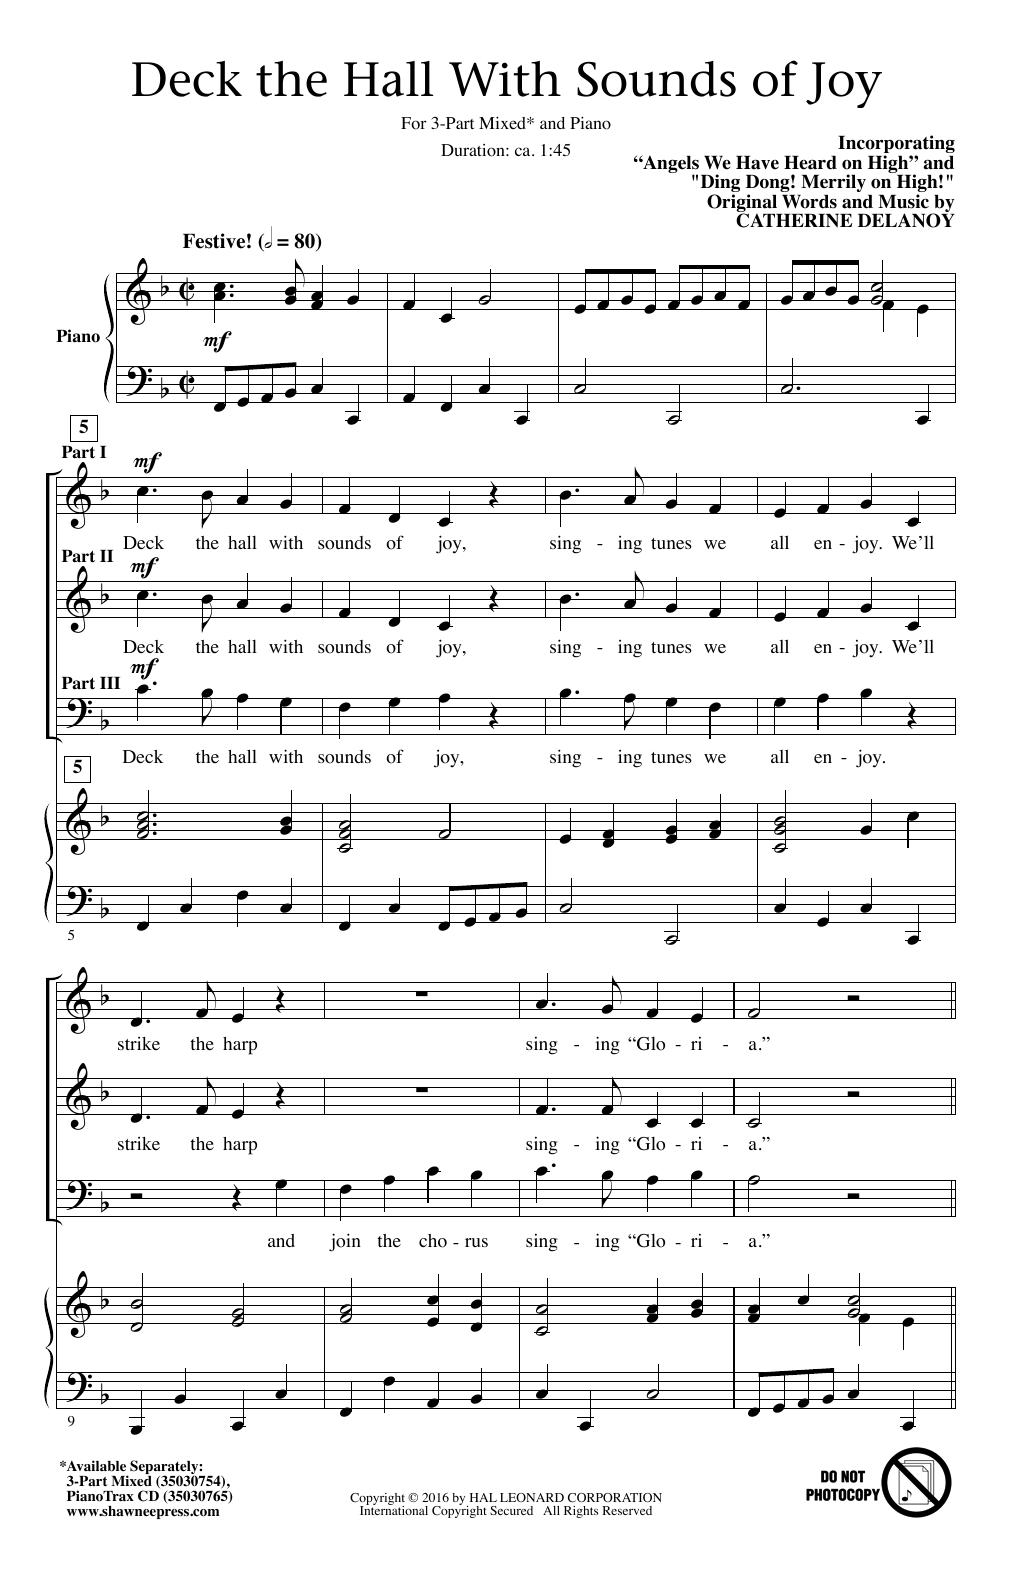 Partition chorale Deck The Hall With Sounds Of Joy de Catherine DeLanoy - 3 voix mixtes